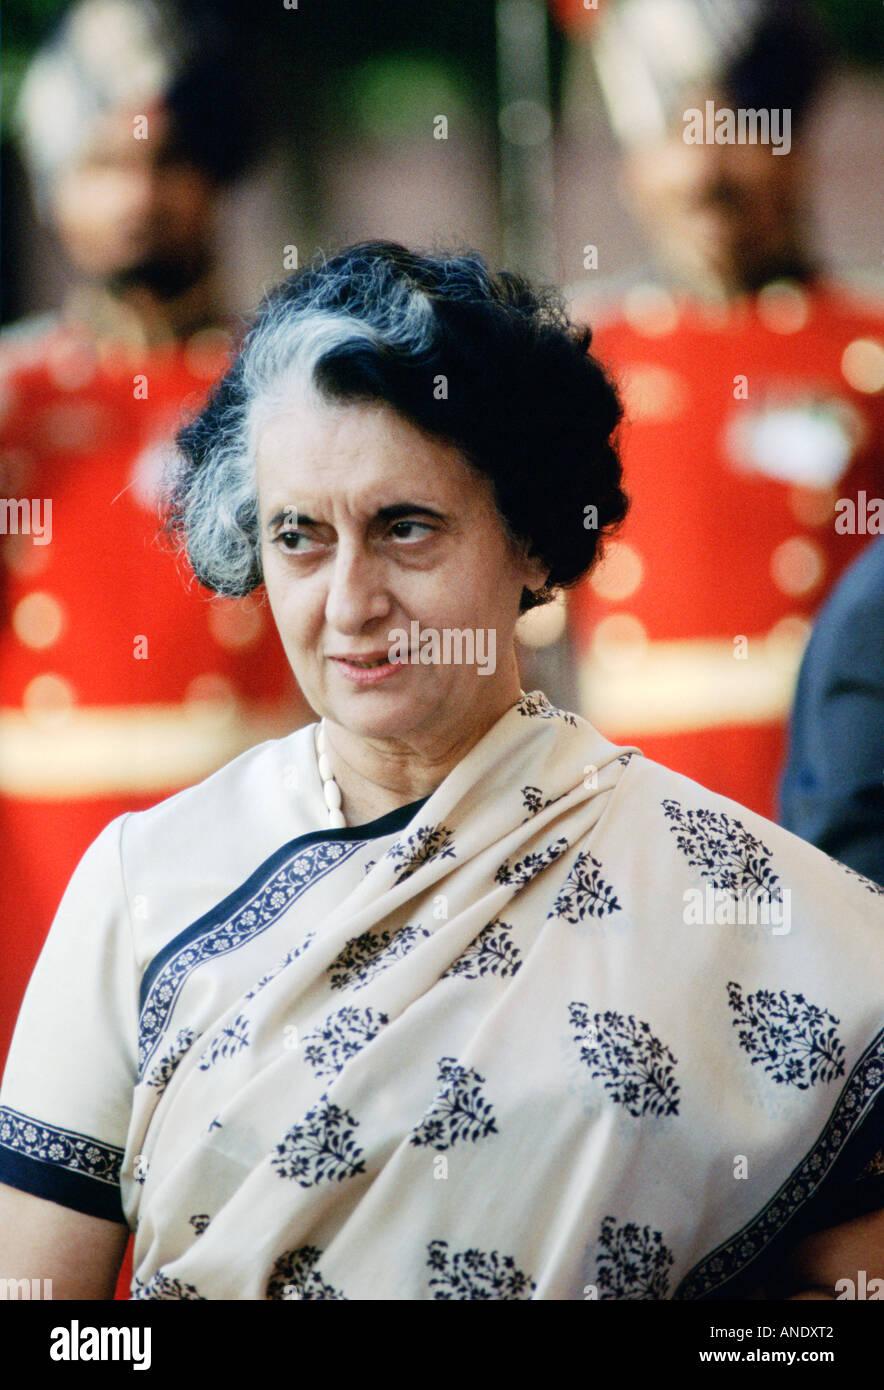 El Primer Ministro de la India, Indira Ghandi India Imagen De Stock